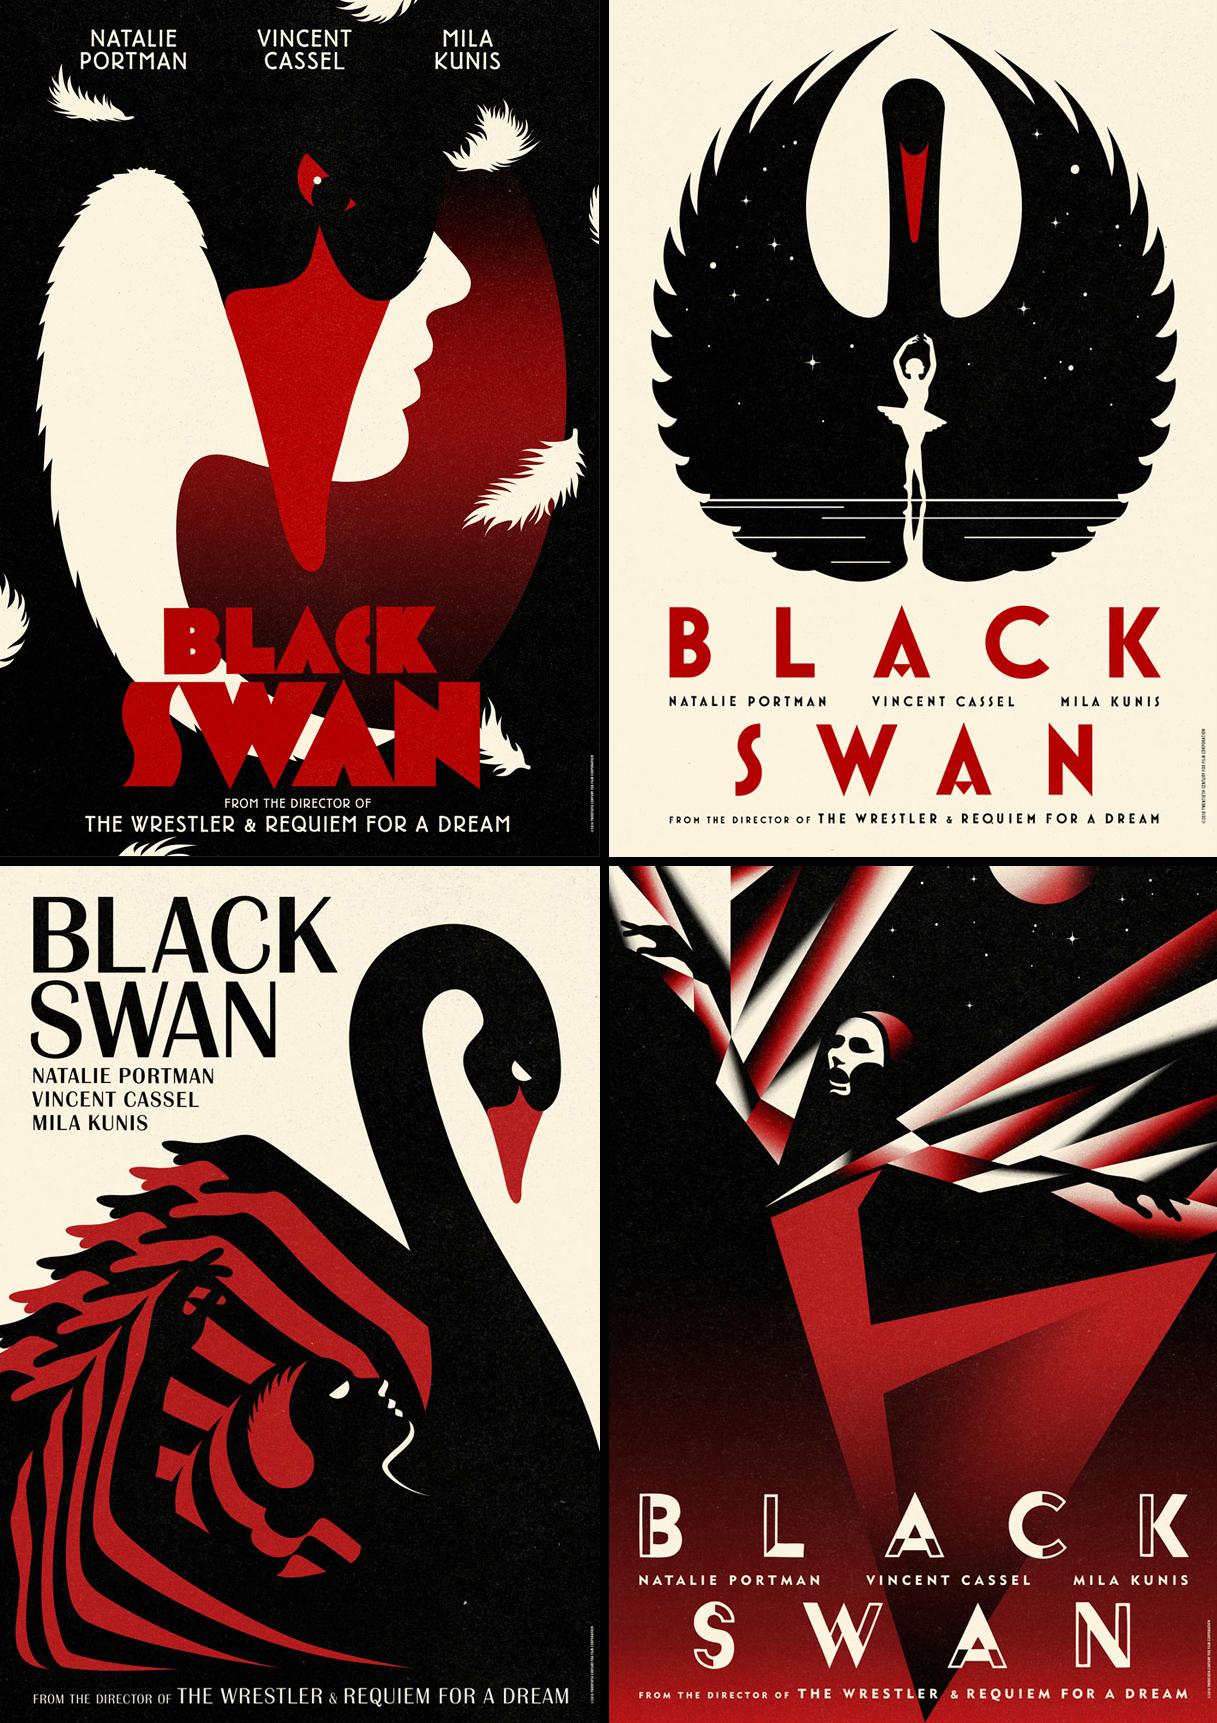 La Boca / International Posters For Darren Aronofsky's Black Swan Film